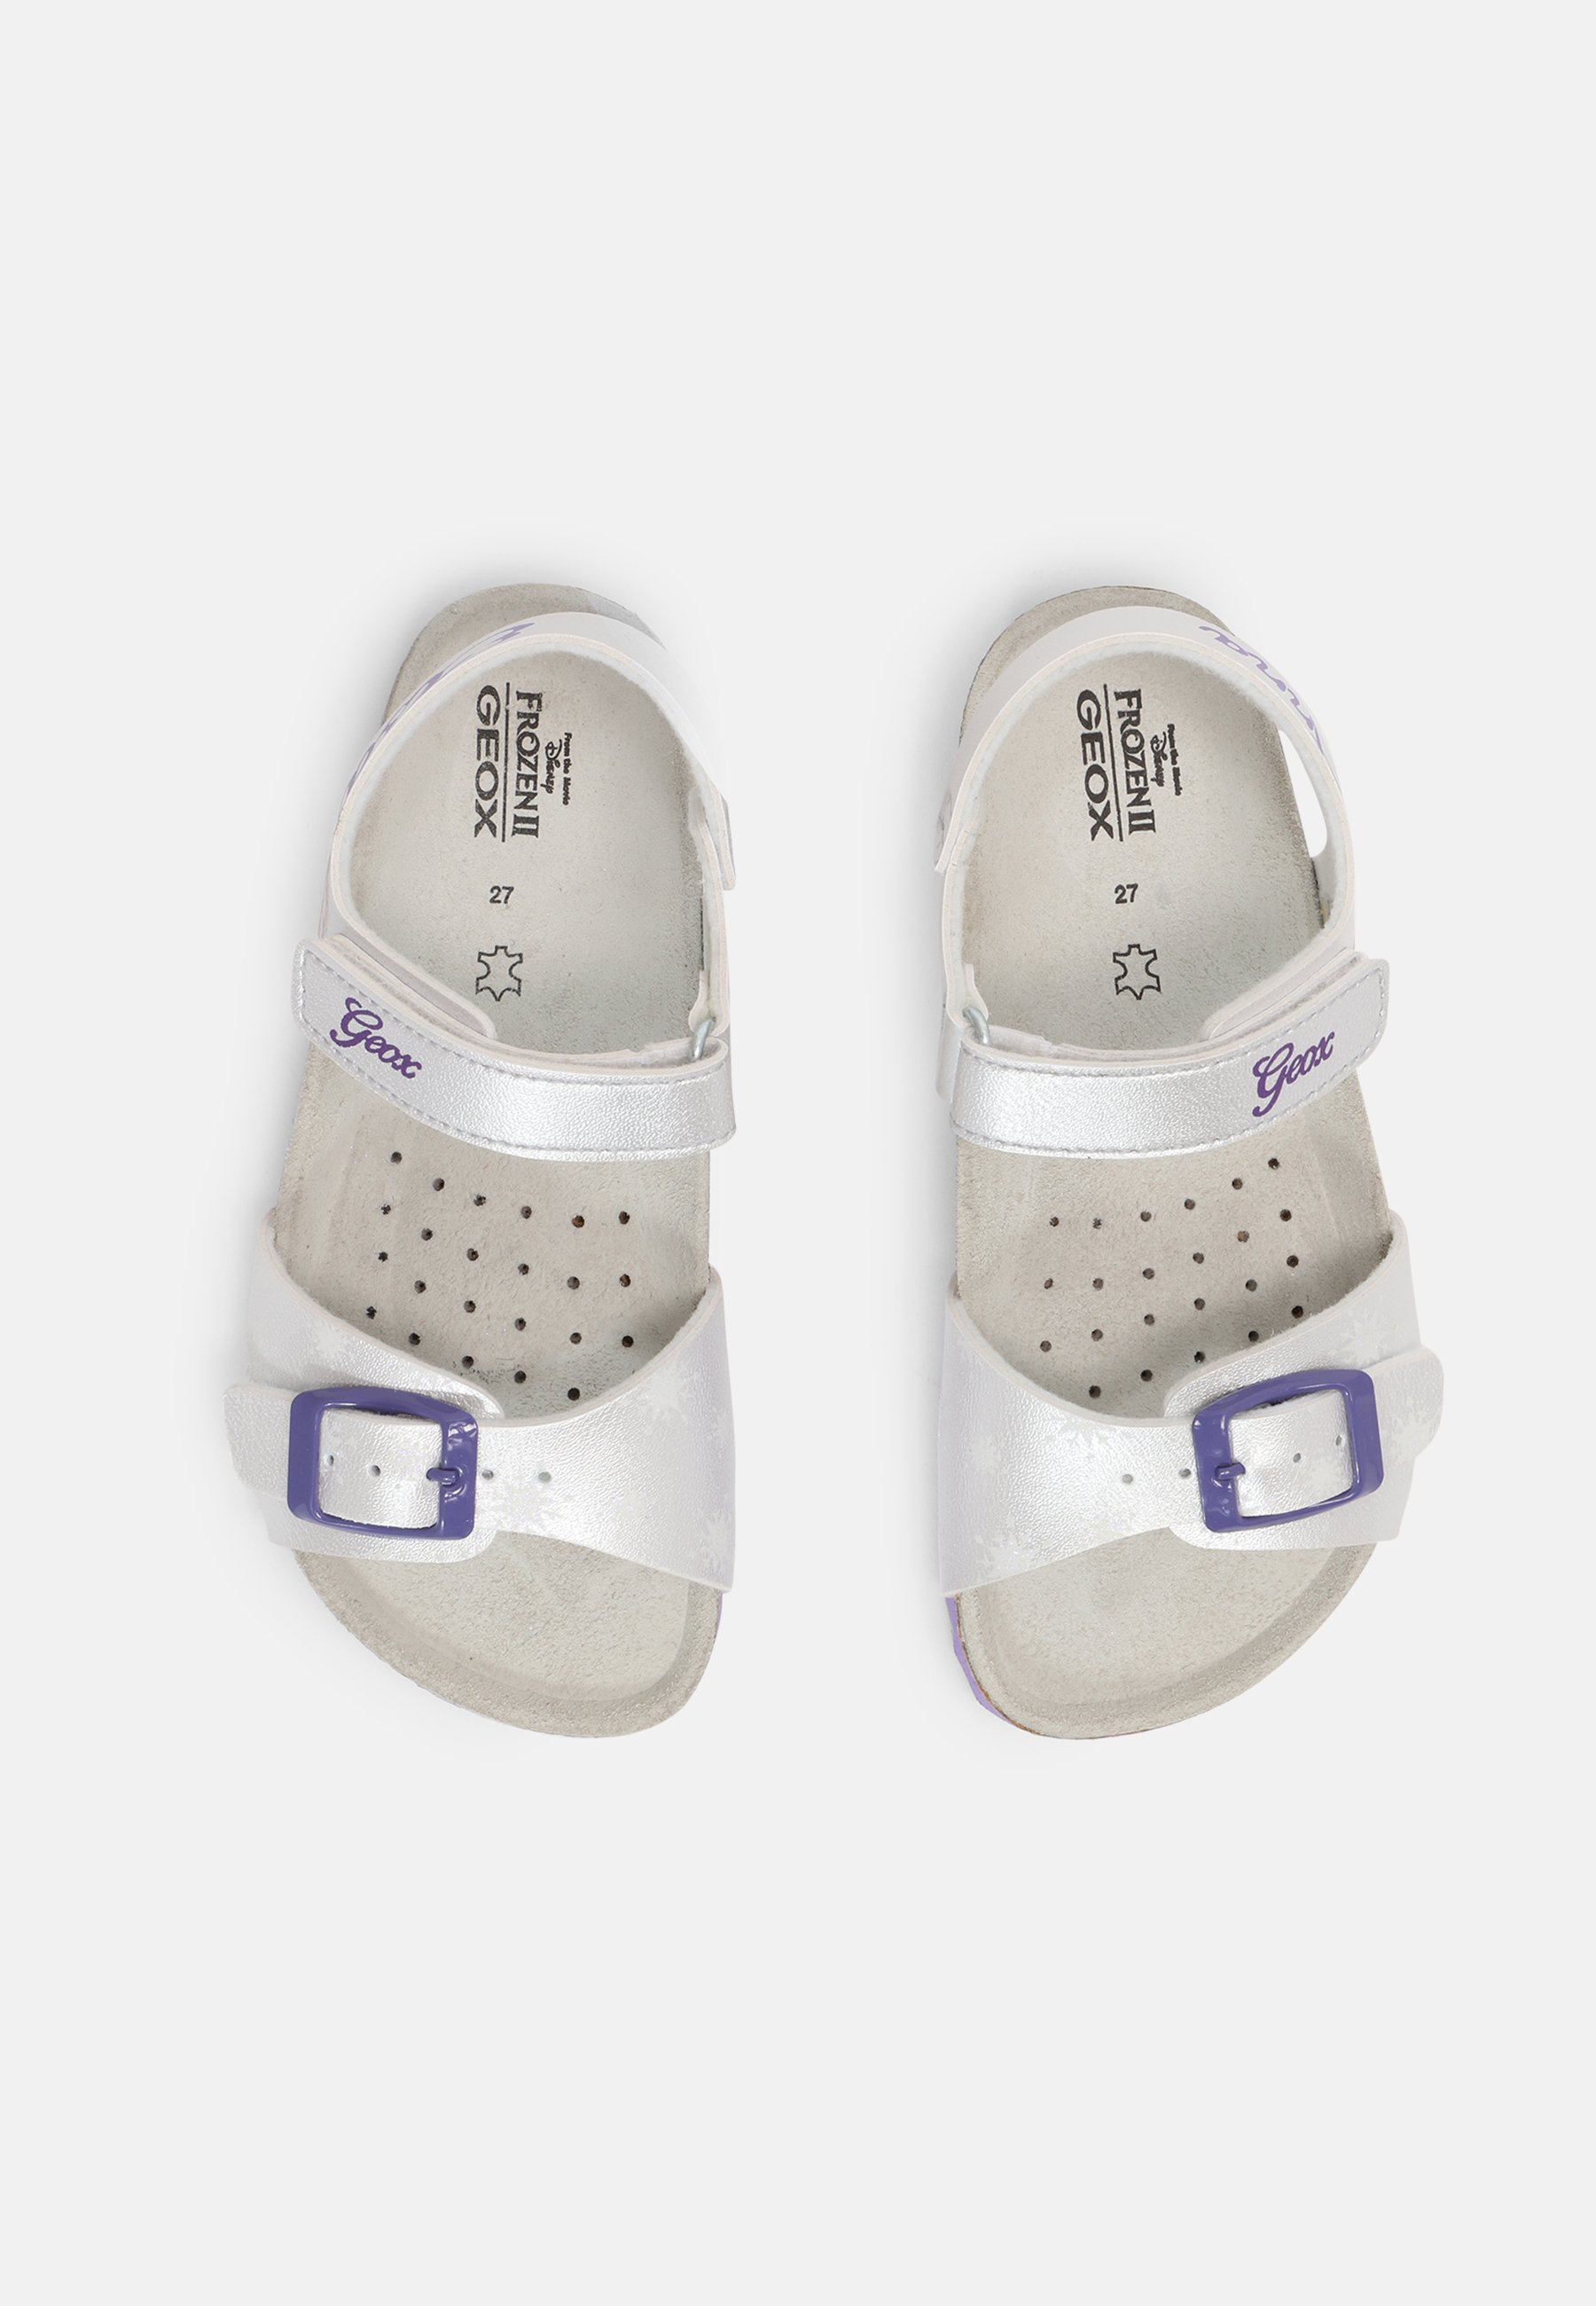 Kids ADRIEL GIRL DISNEY FROZEN GEOX- Sandals - Sandals